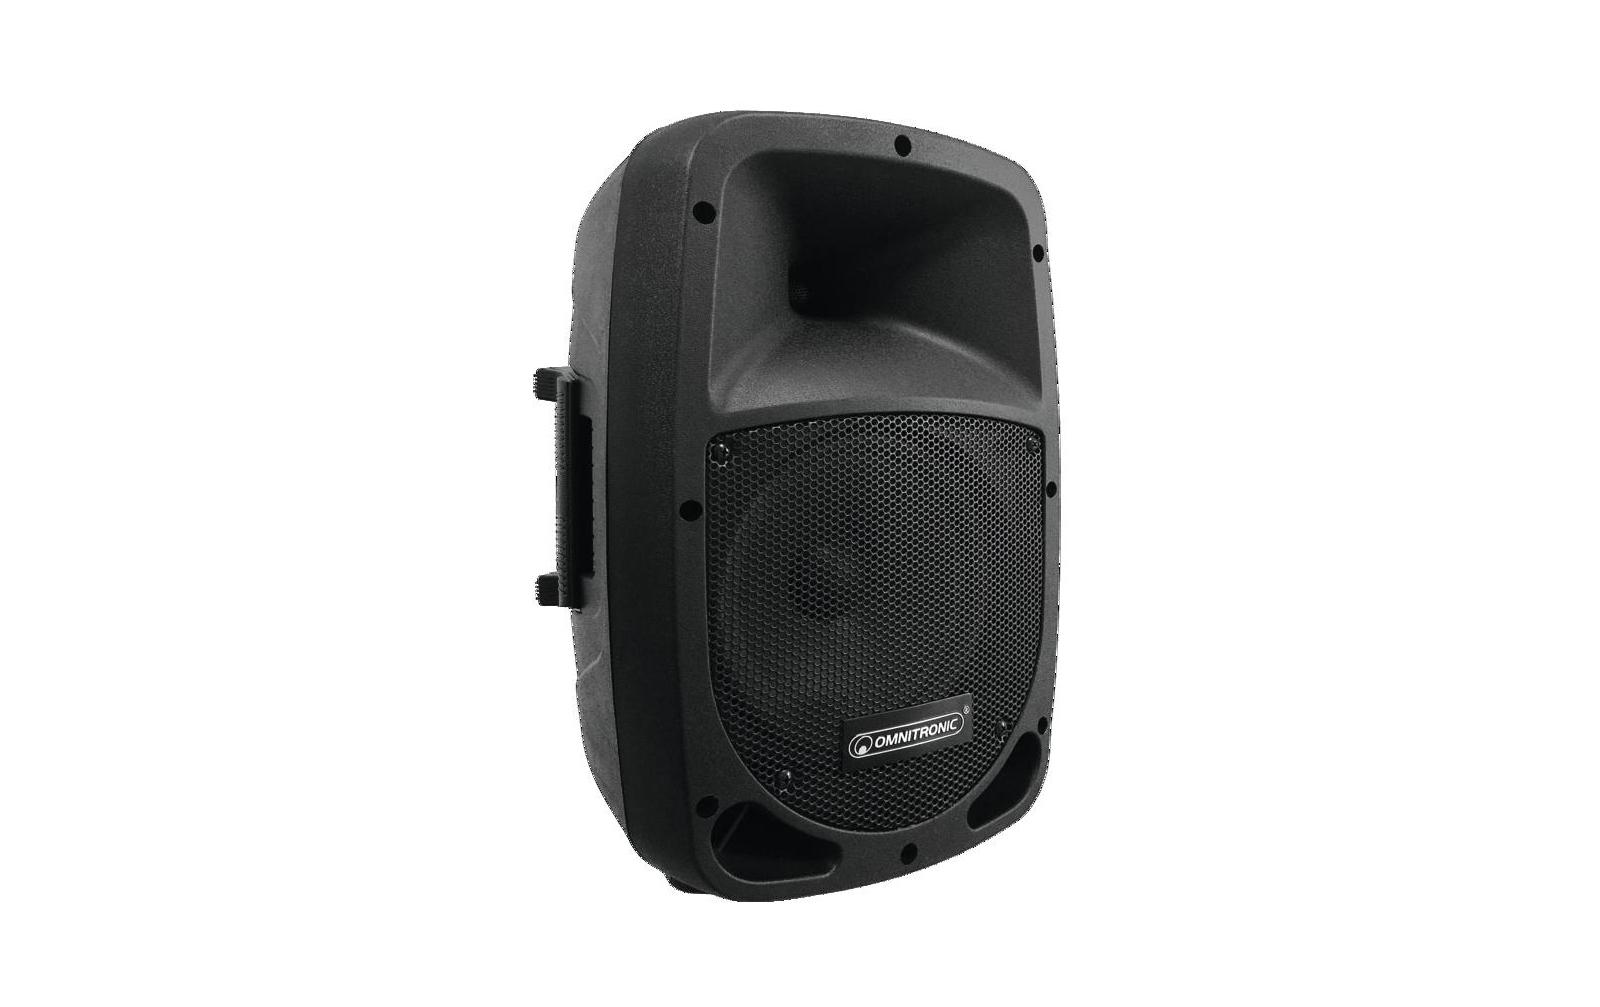 omnitronic-vfm-208-2-wege-lautsprecher